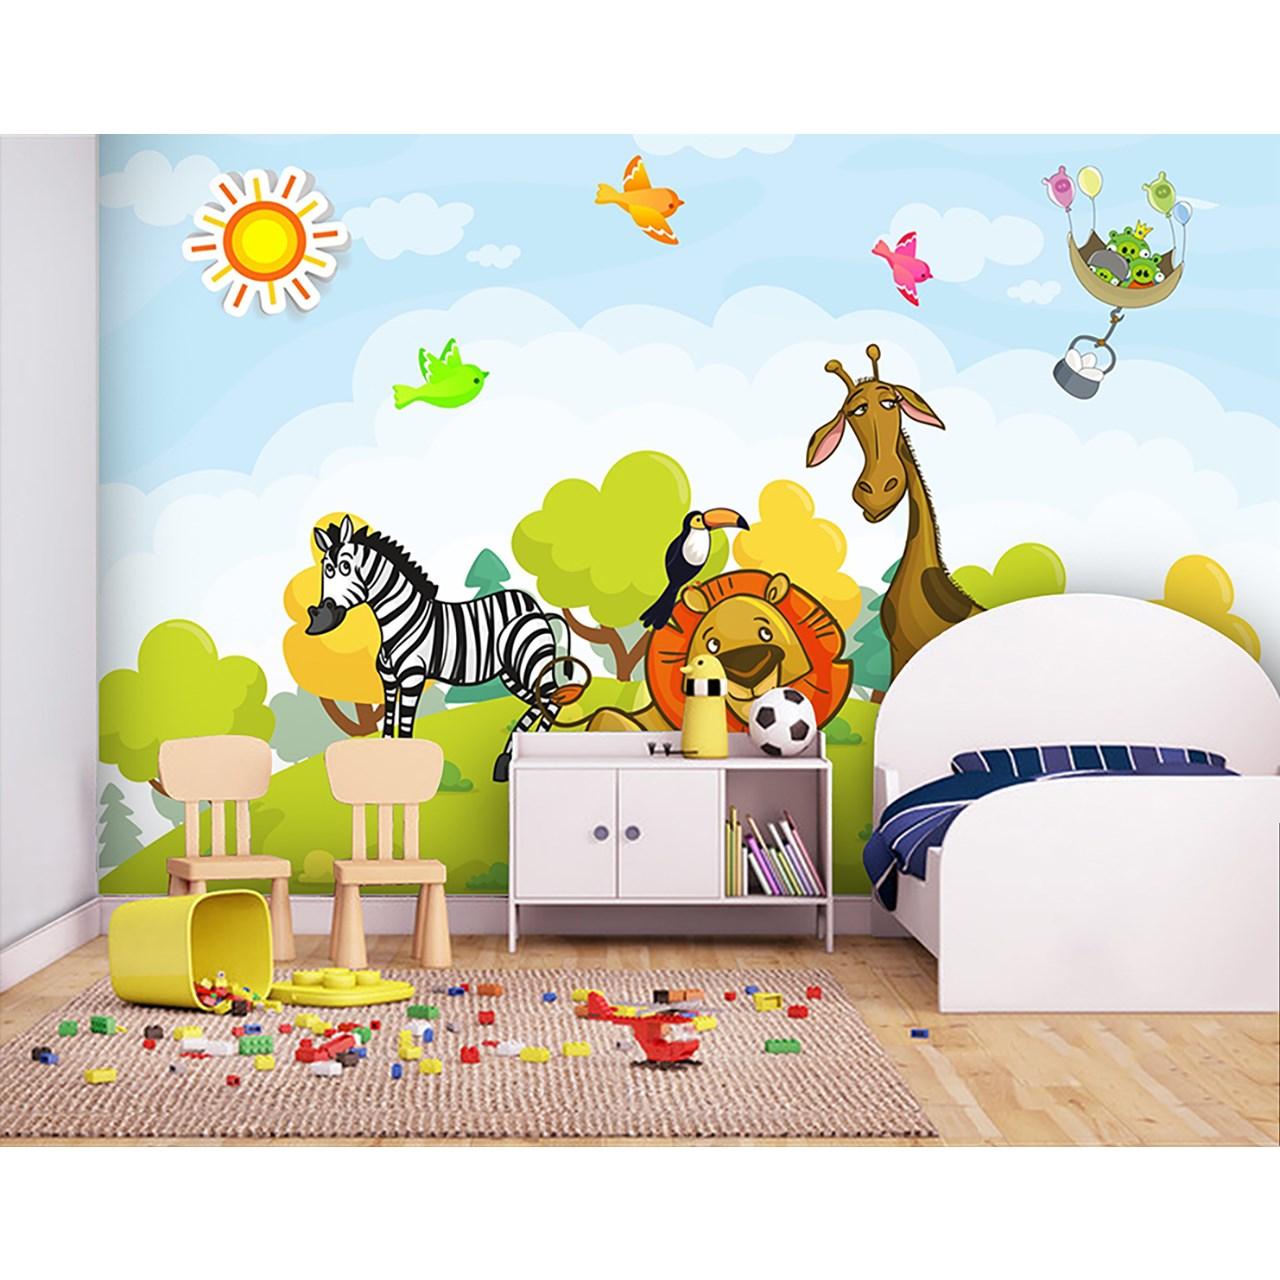 پوستر دیواری بومرنگ کد BKW-043